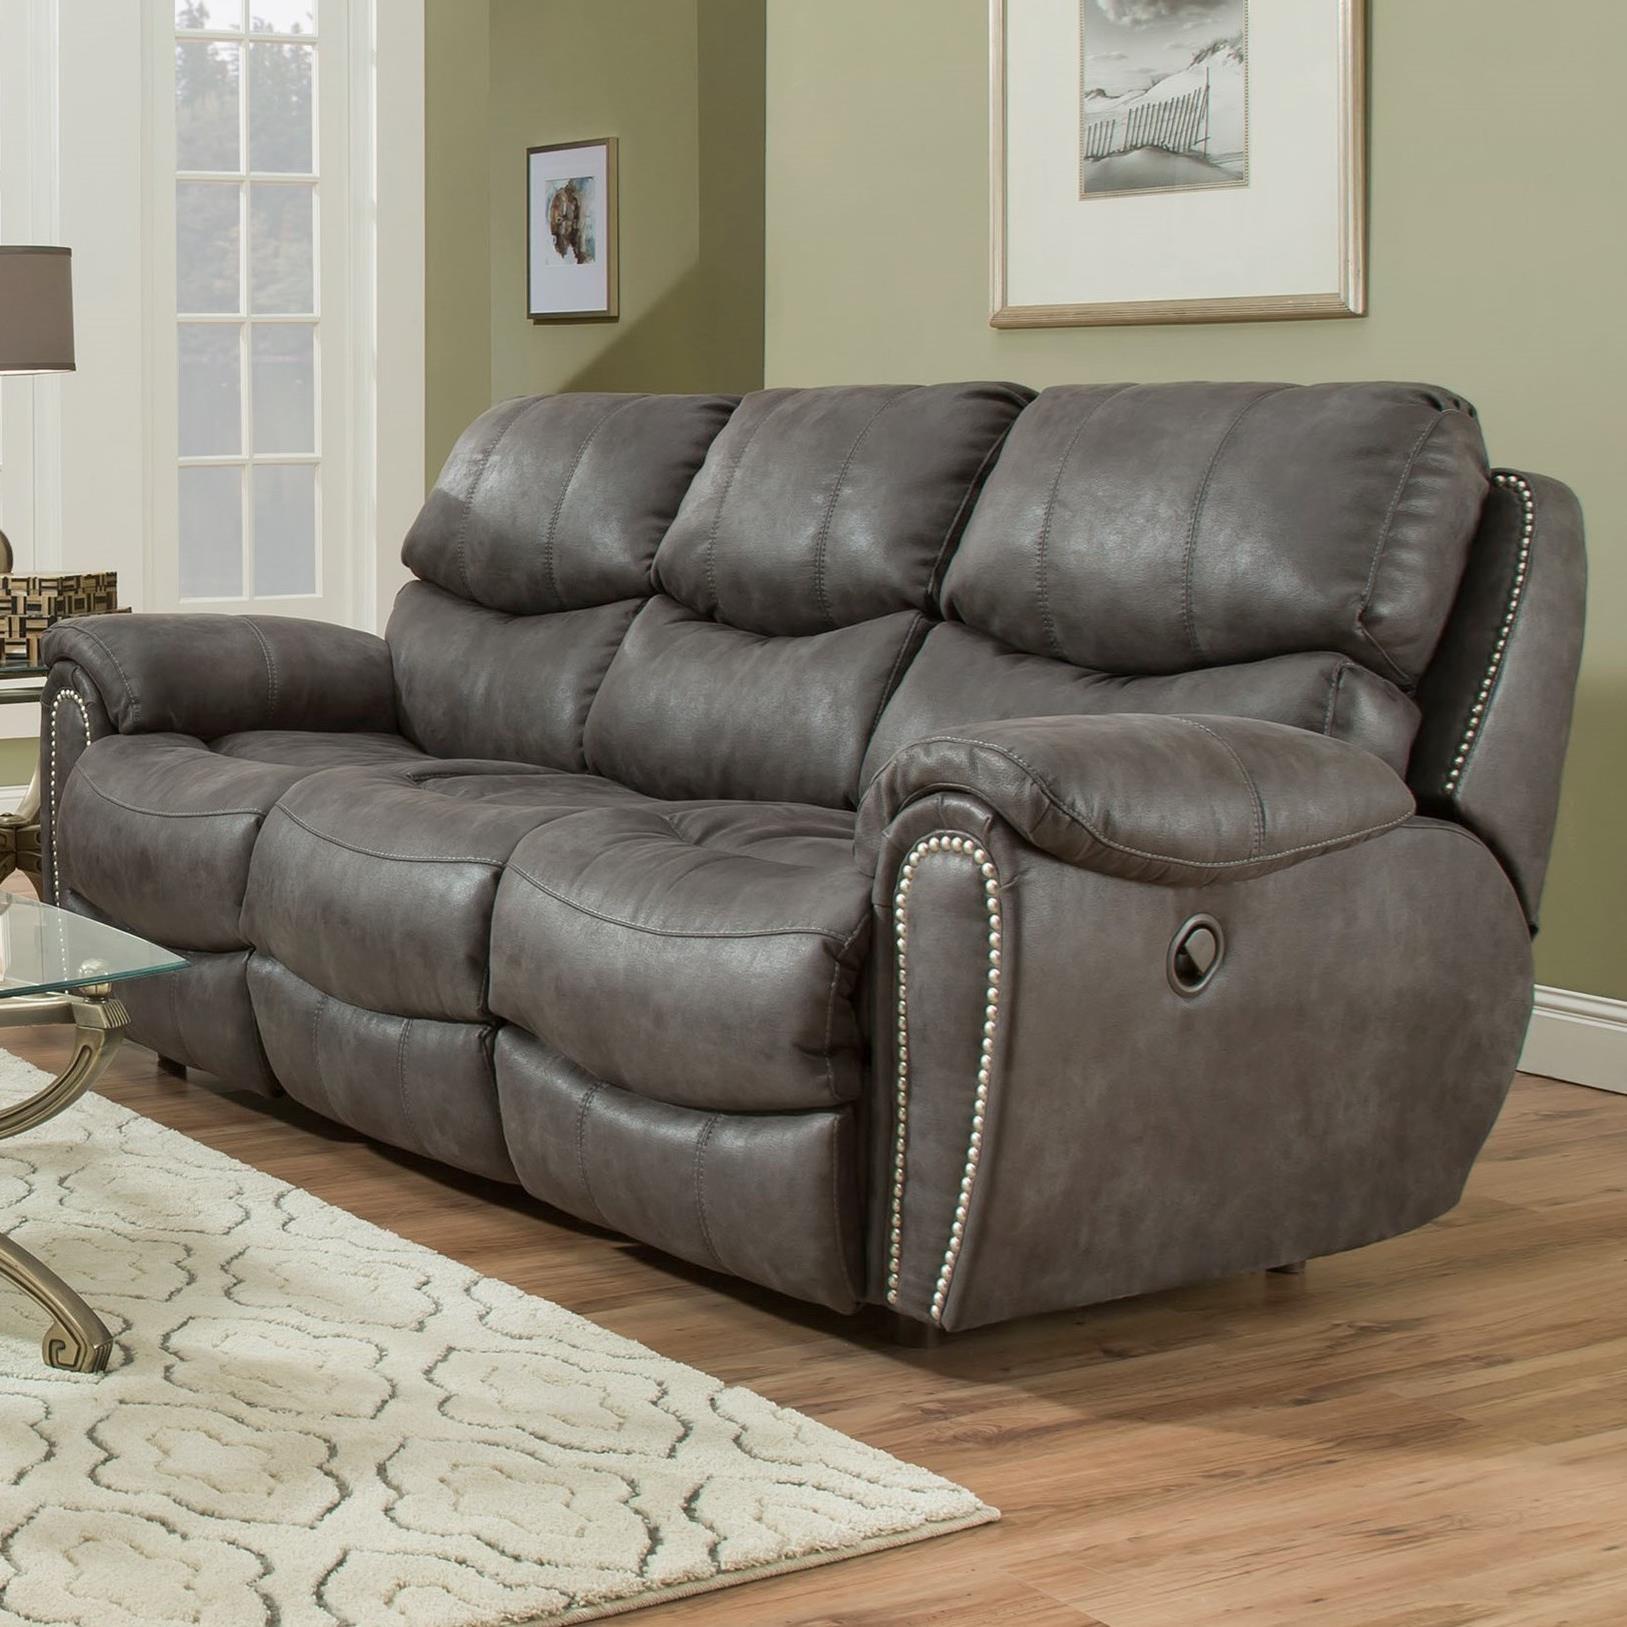 Incroyable Franklin Richmond Reclining Sofa With Nailhead Trim